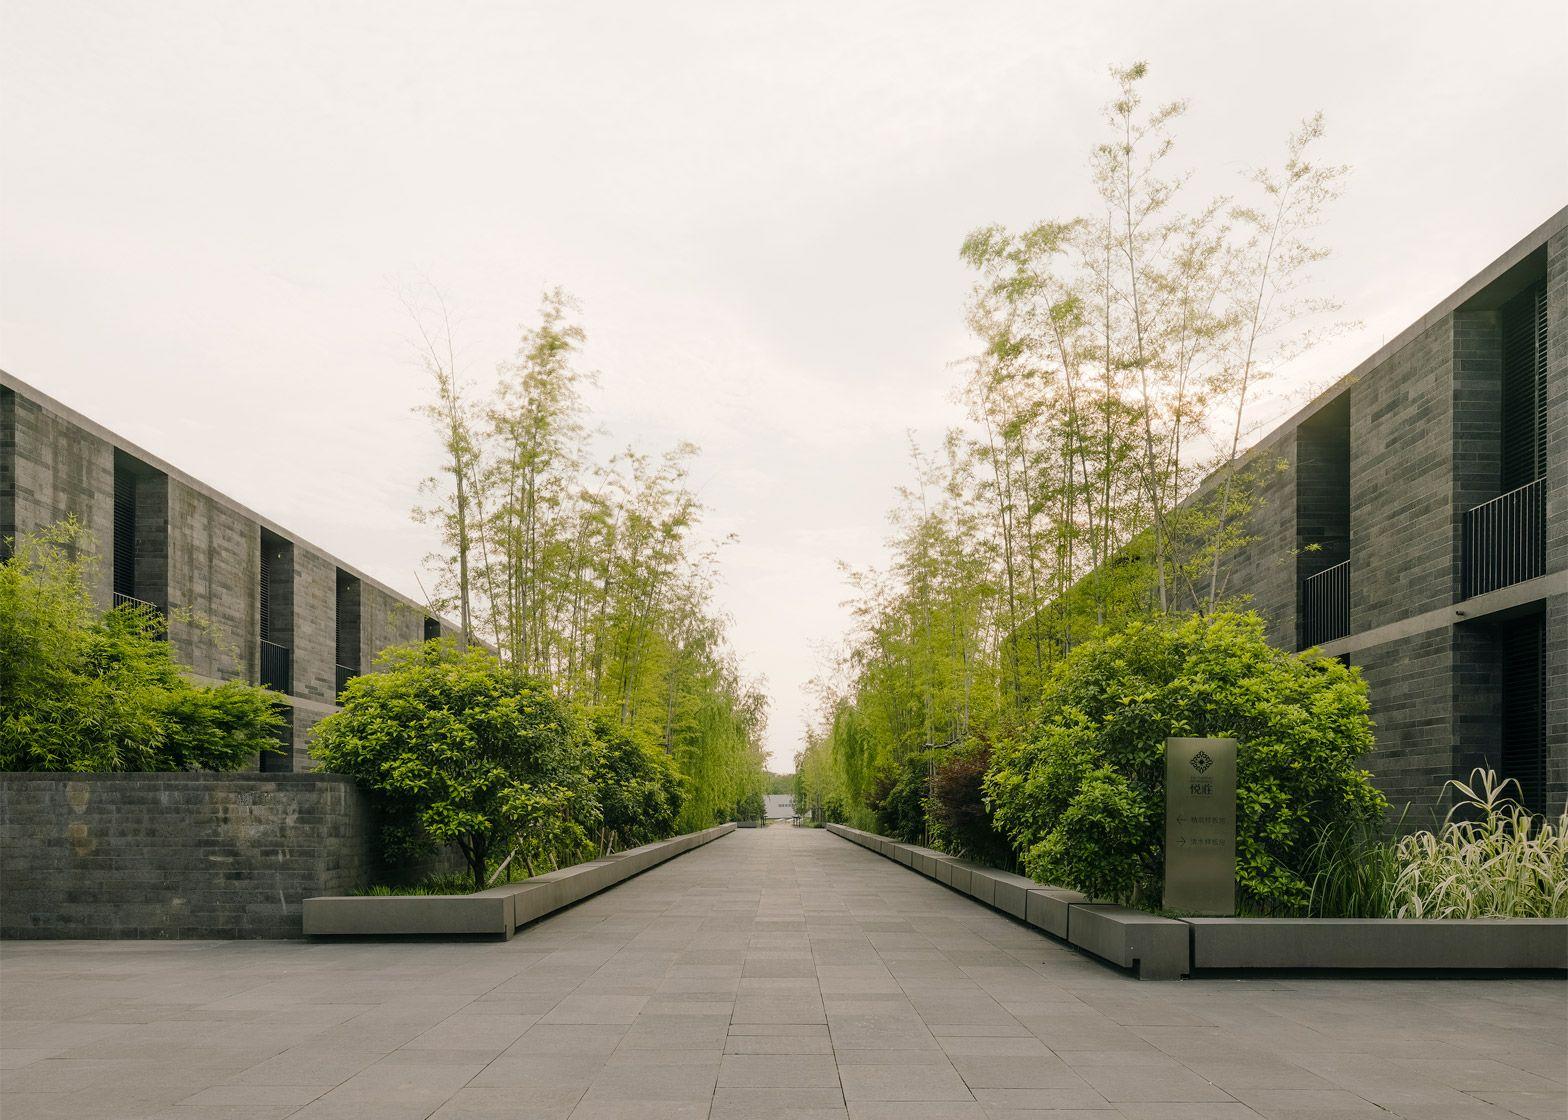 David Chipperfield Creates Village Of Stone Dwellings David Chipperfield Architects Landscape Architecture Landscape